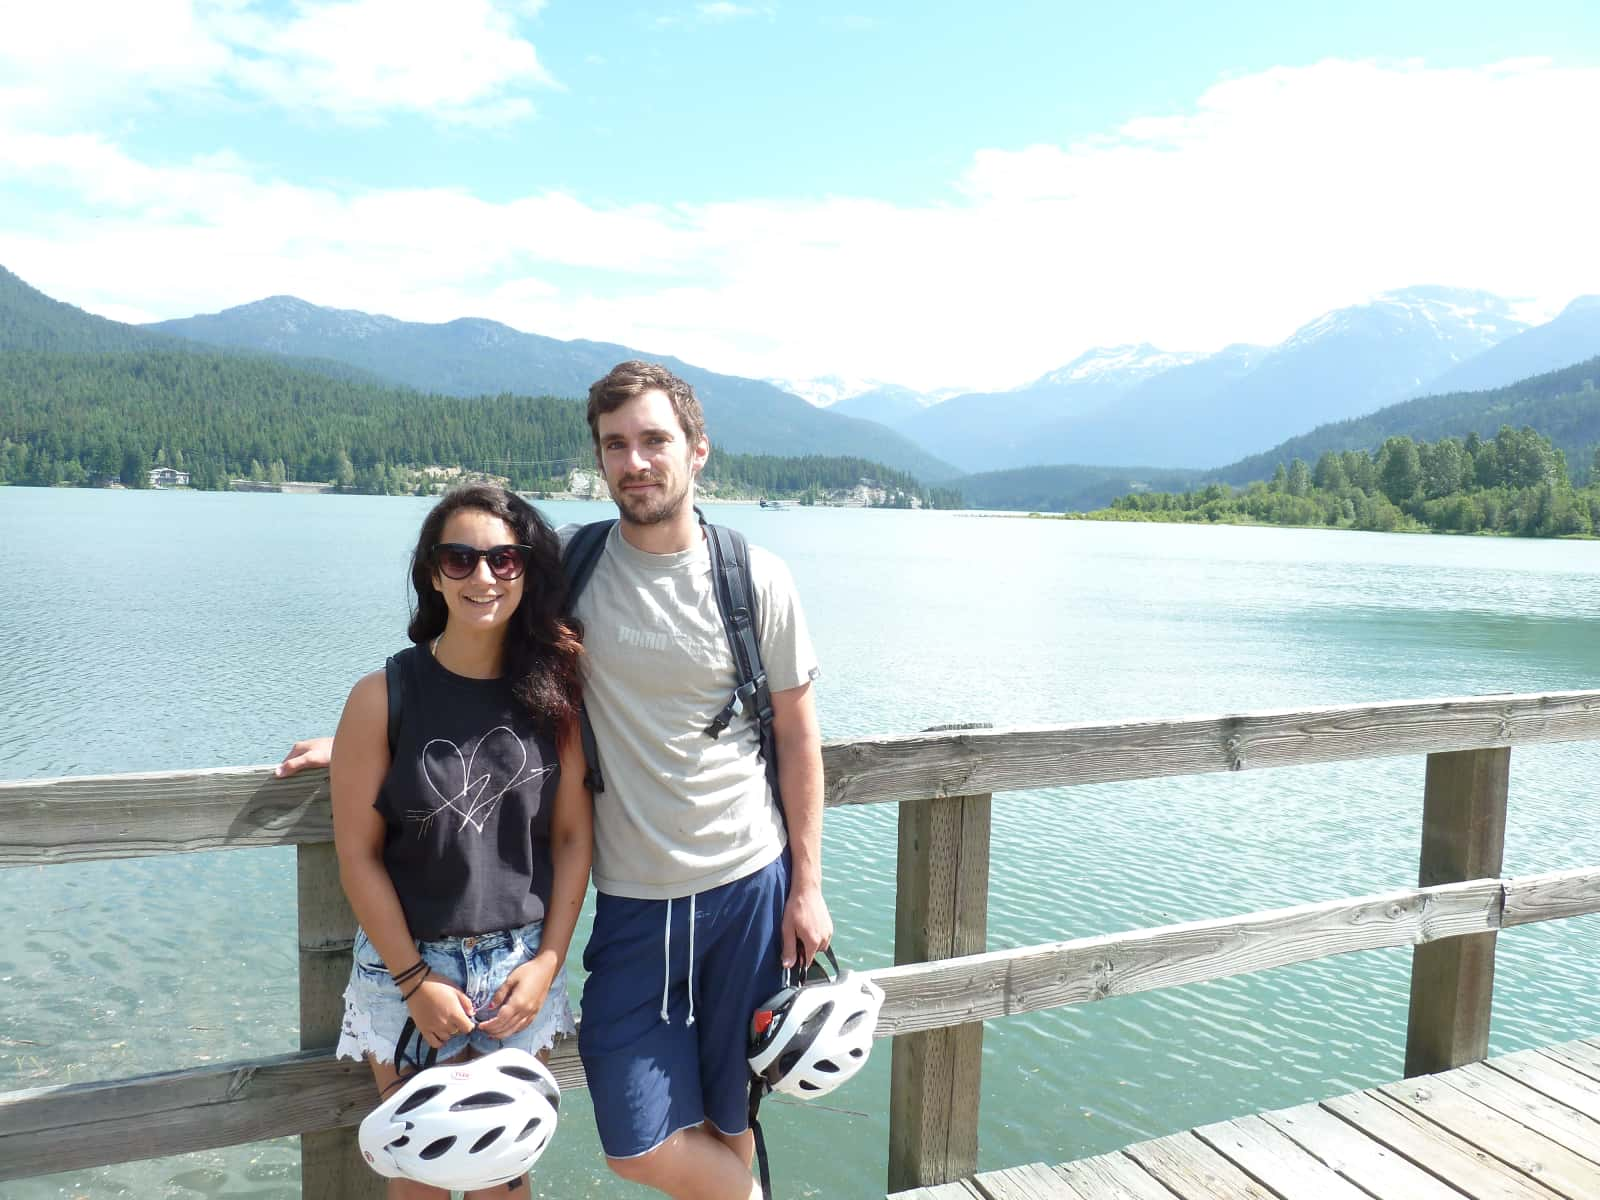 Jenny & David from Vancouver, British Columbia, Canada